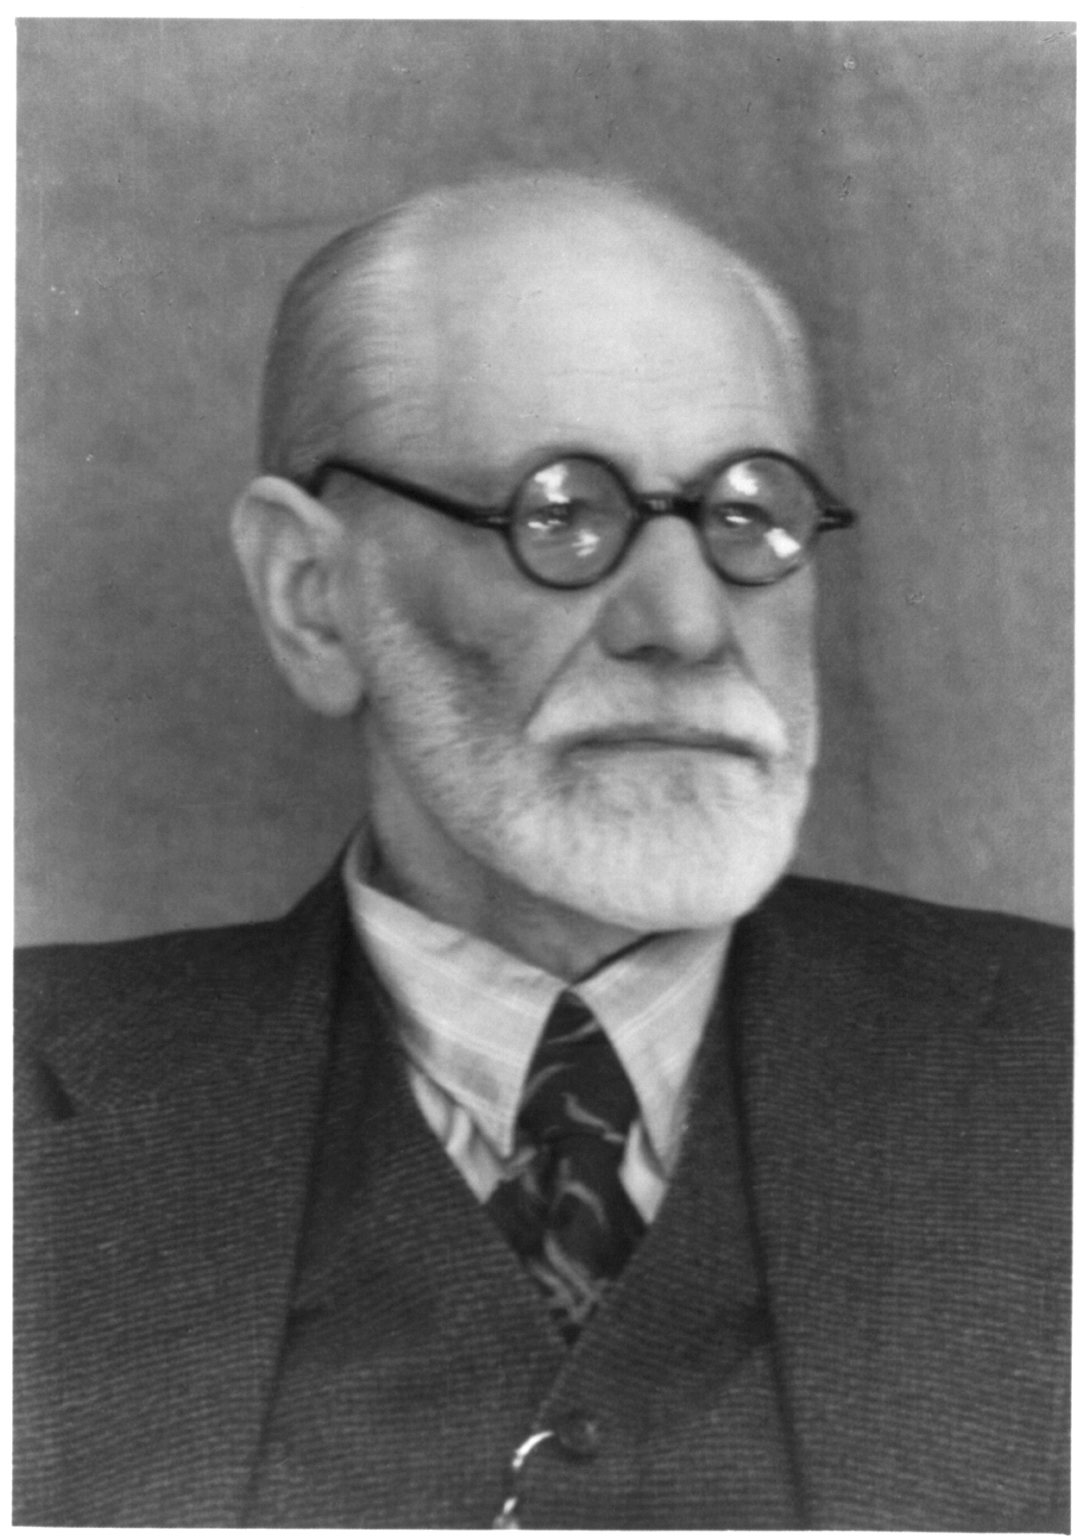 Freud psychosexual development wiki